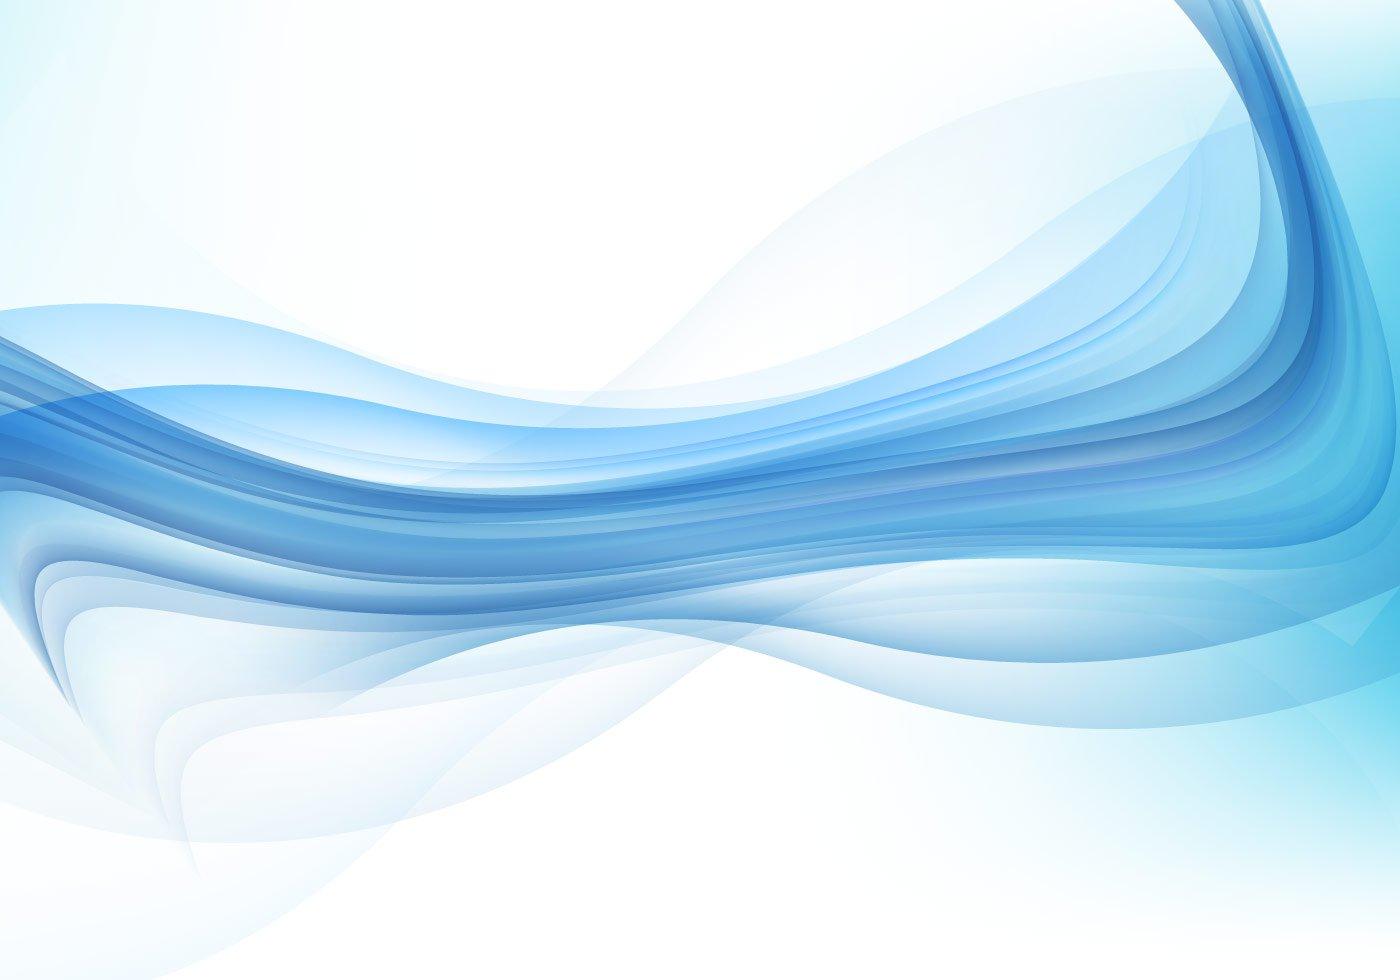 Background HD wallpapers, Desktop wallpaper - most viewed